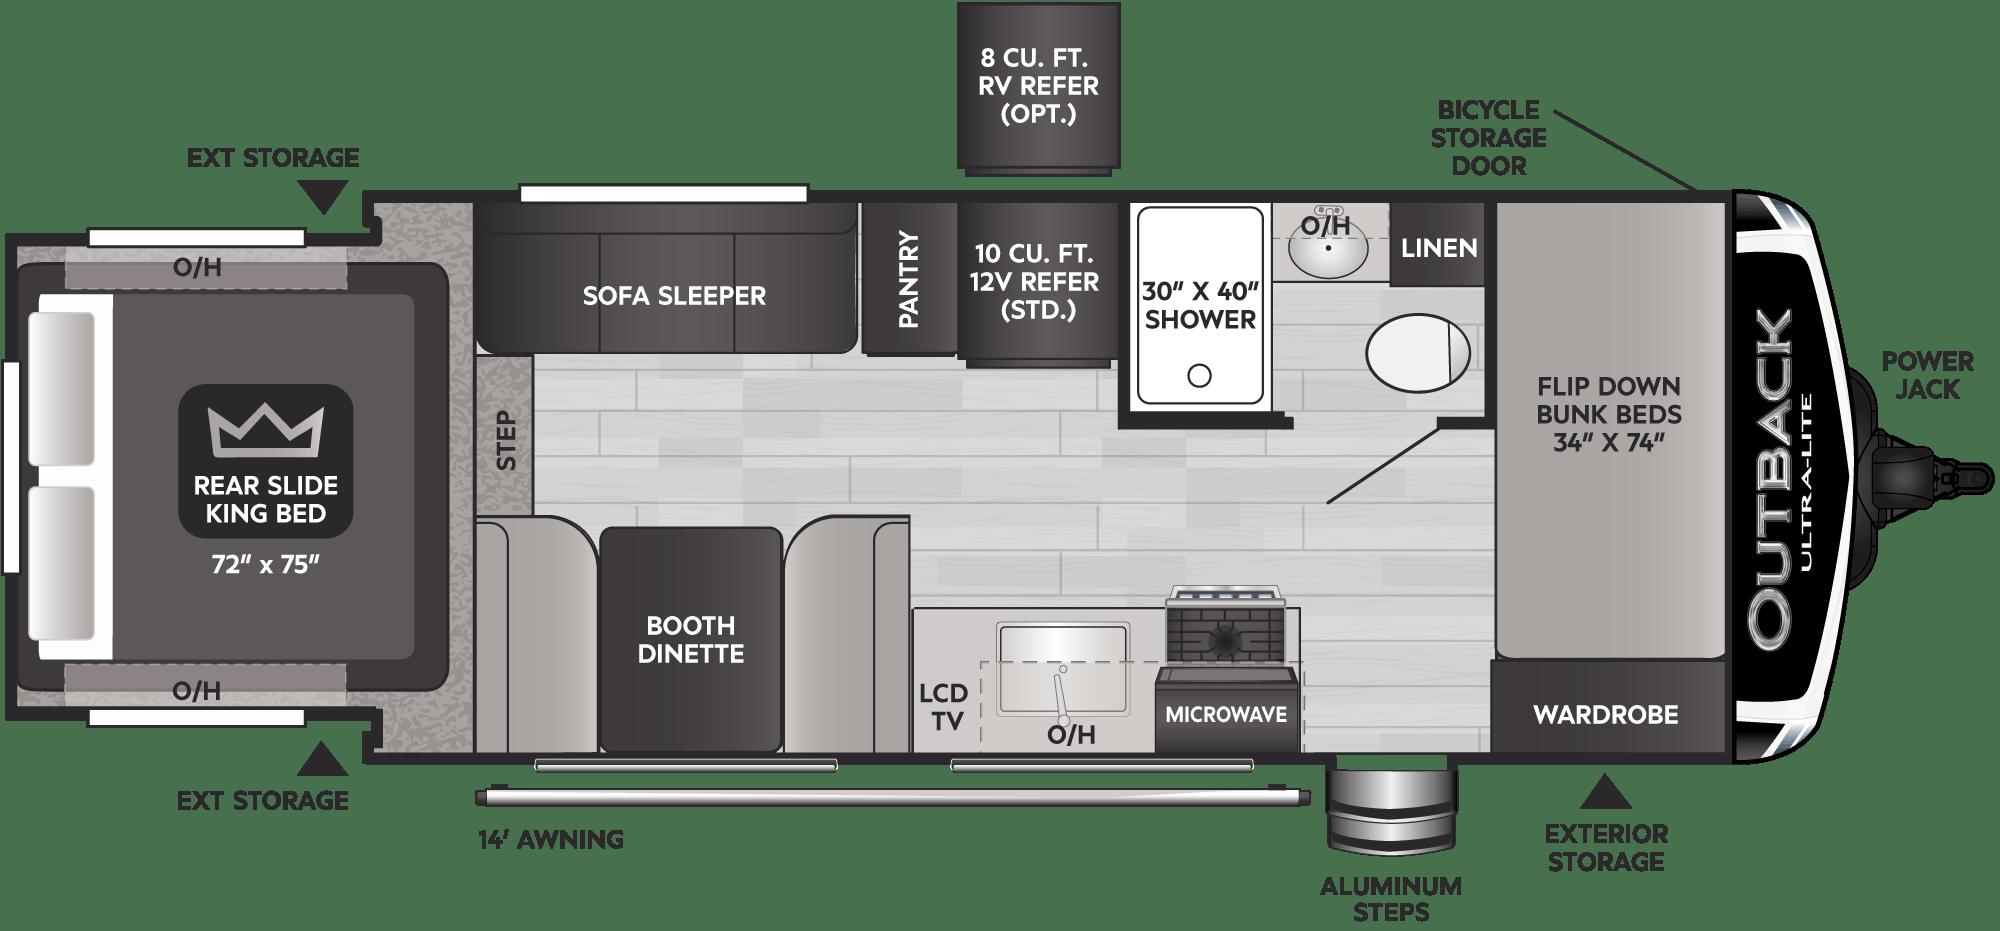 Floorplan of RV model 210URS